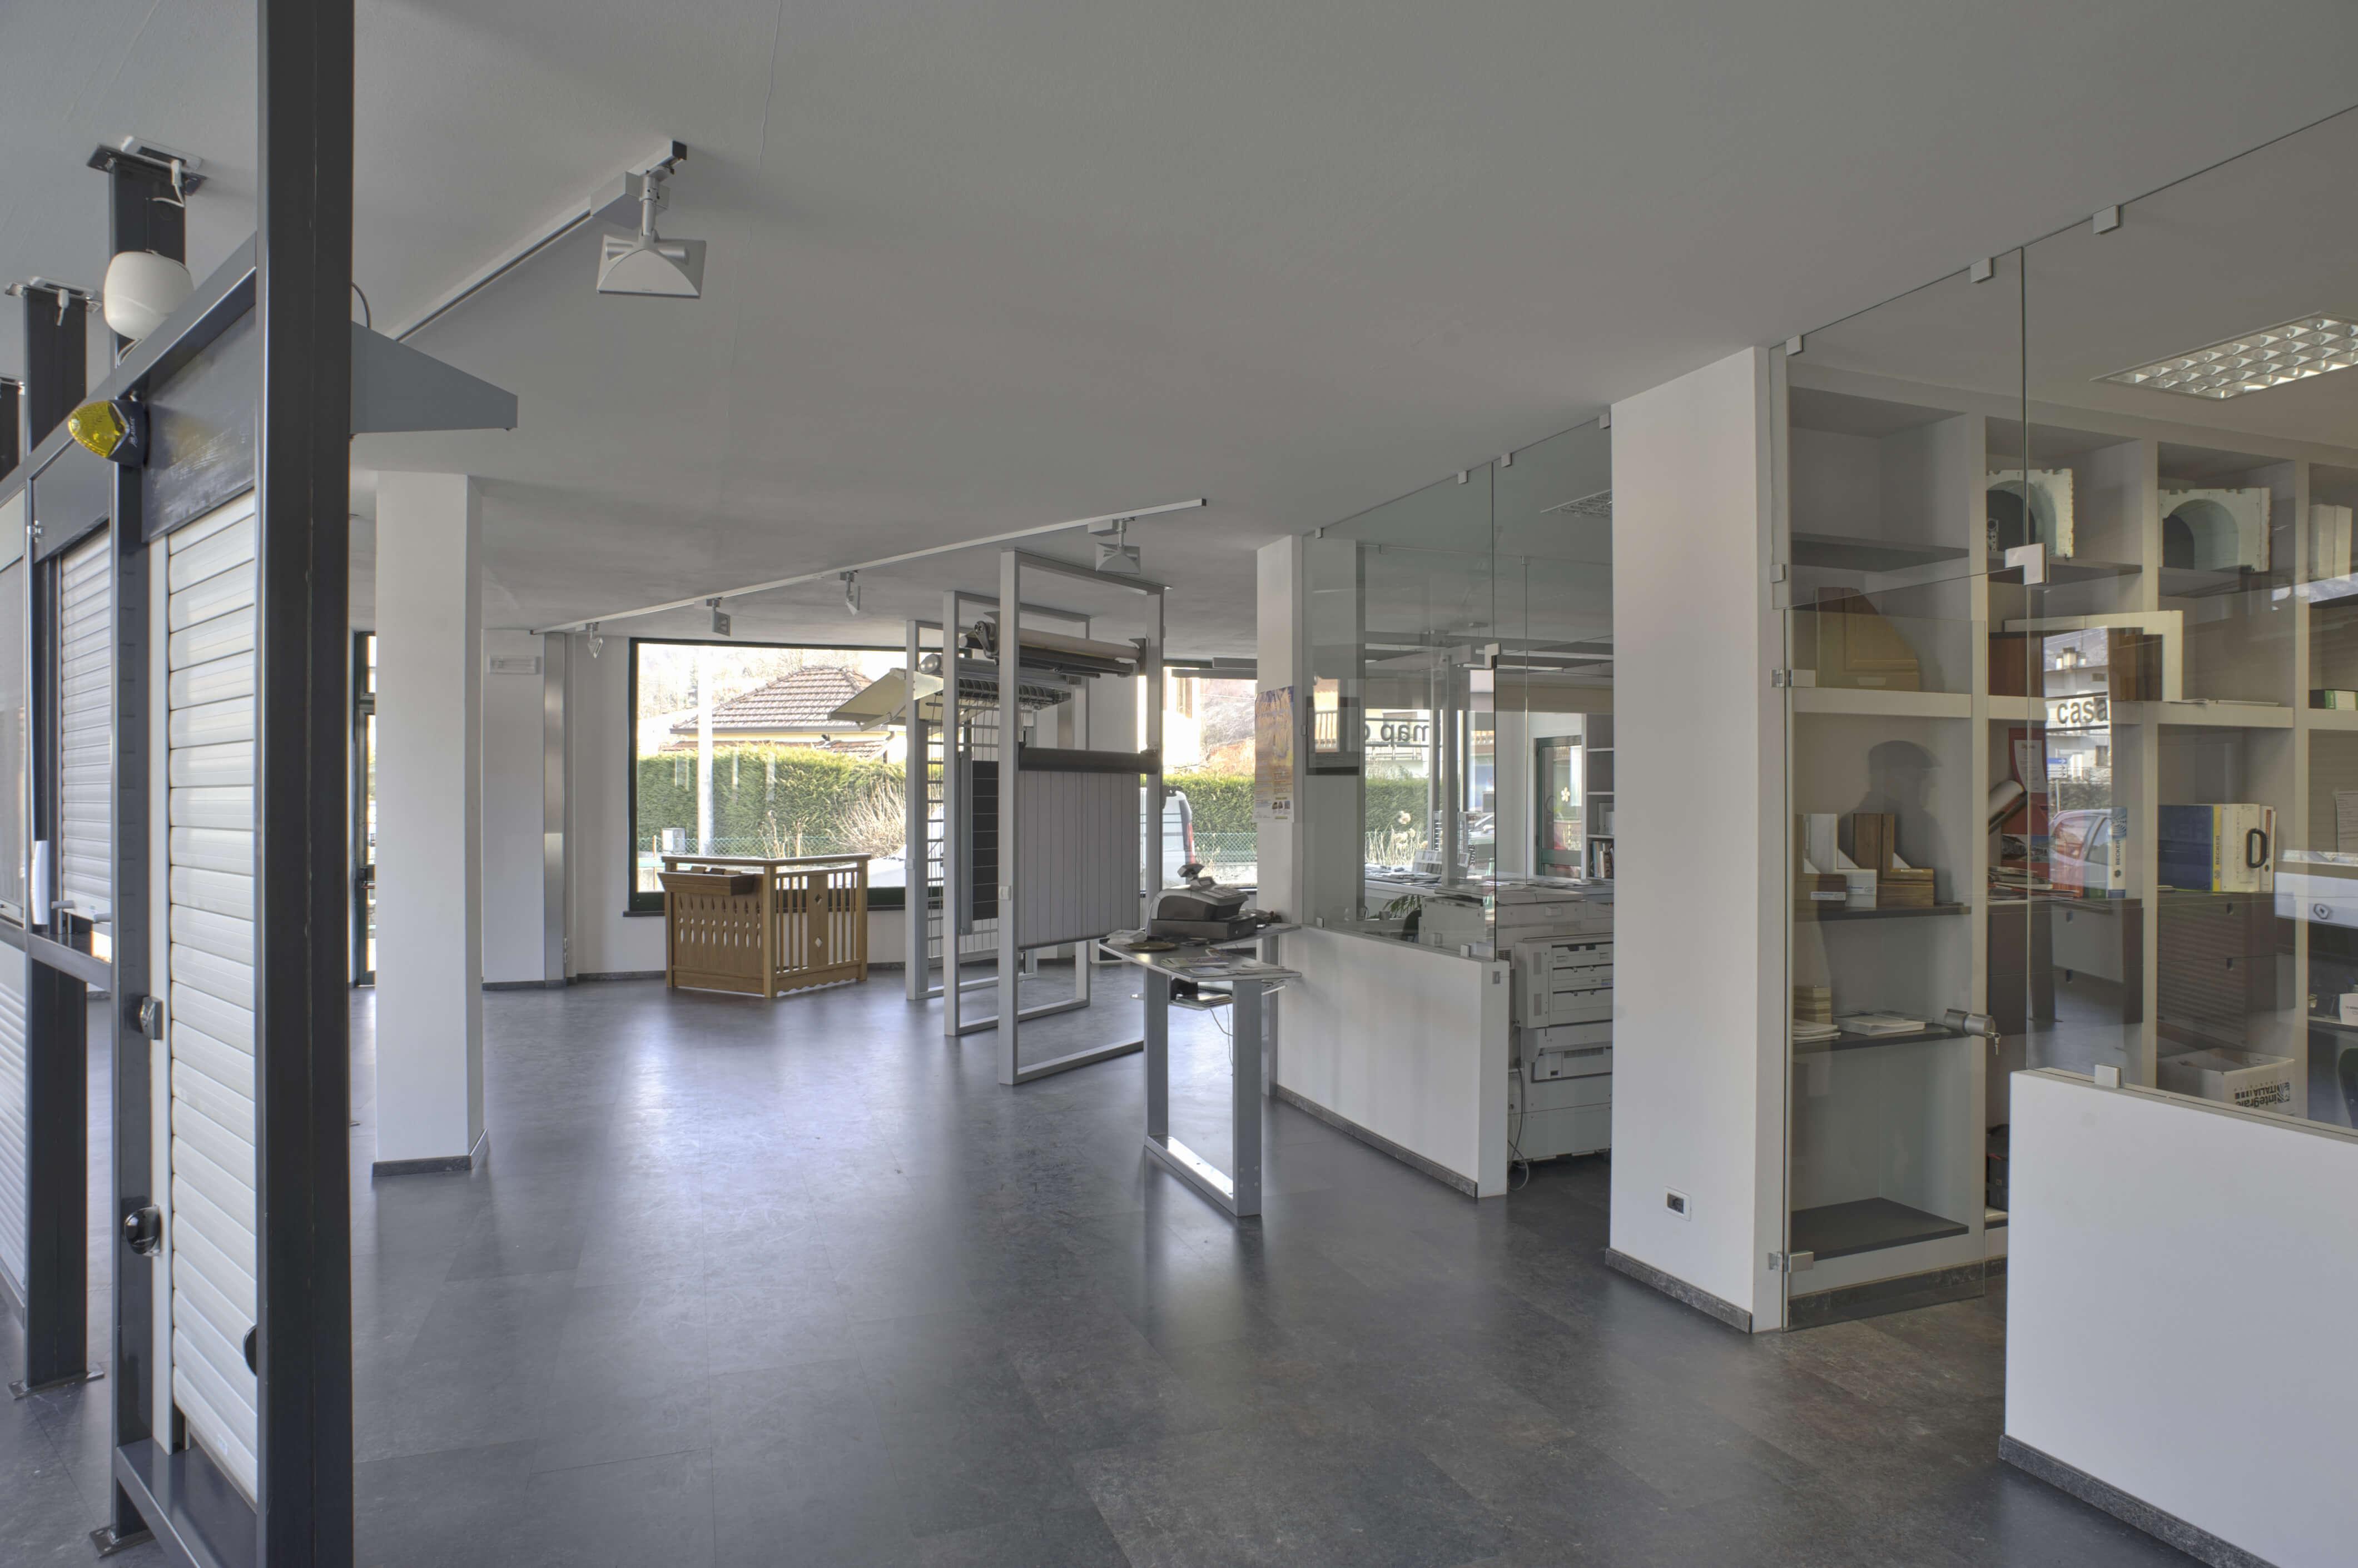 Imap casa srl azienda artigiana dal 1991 tende e for Ricambi tende velux